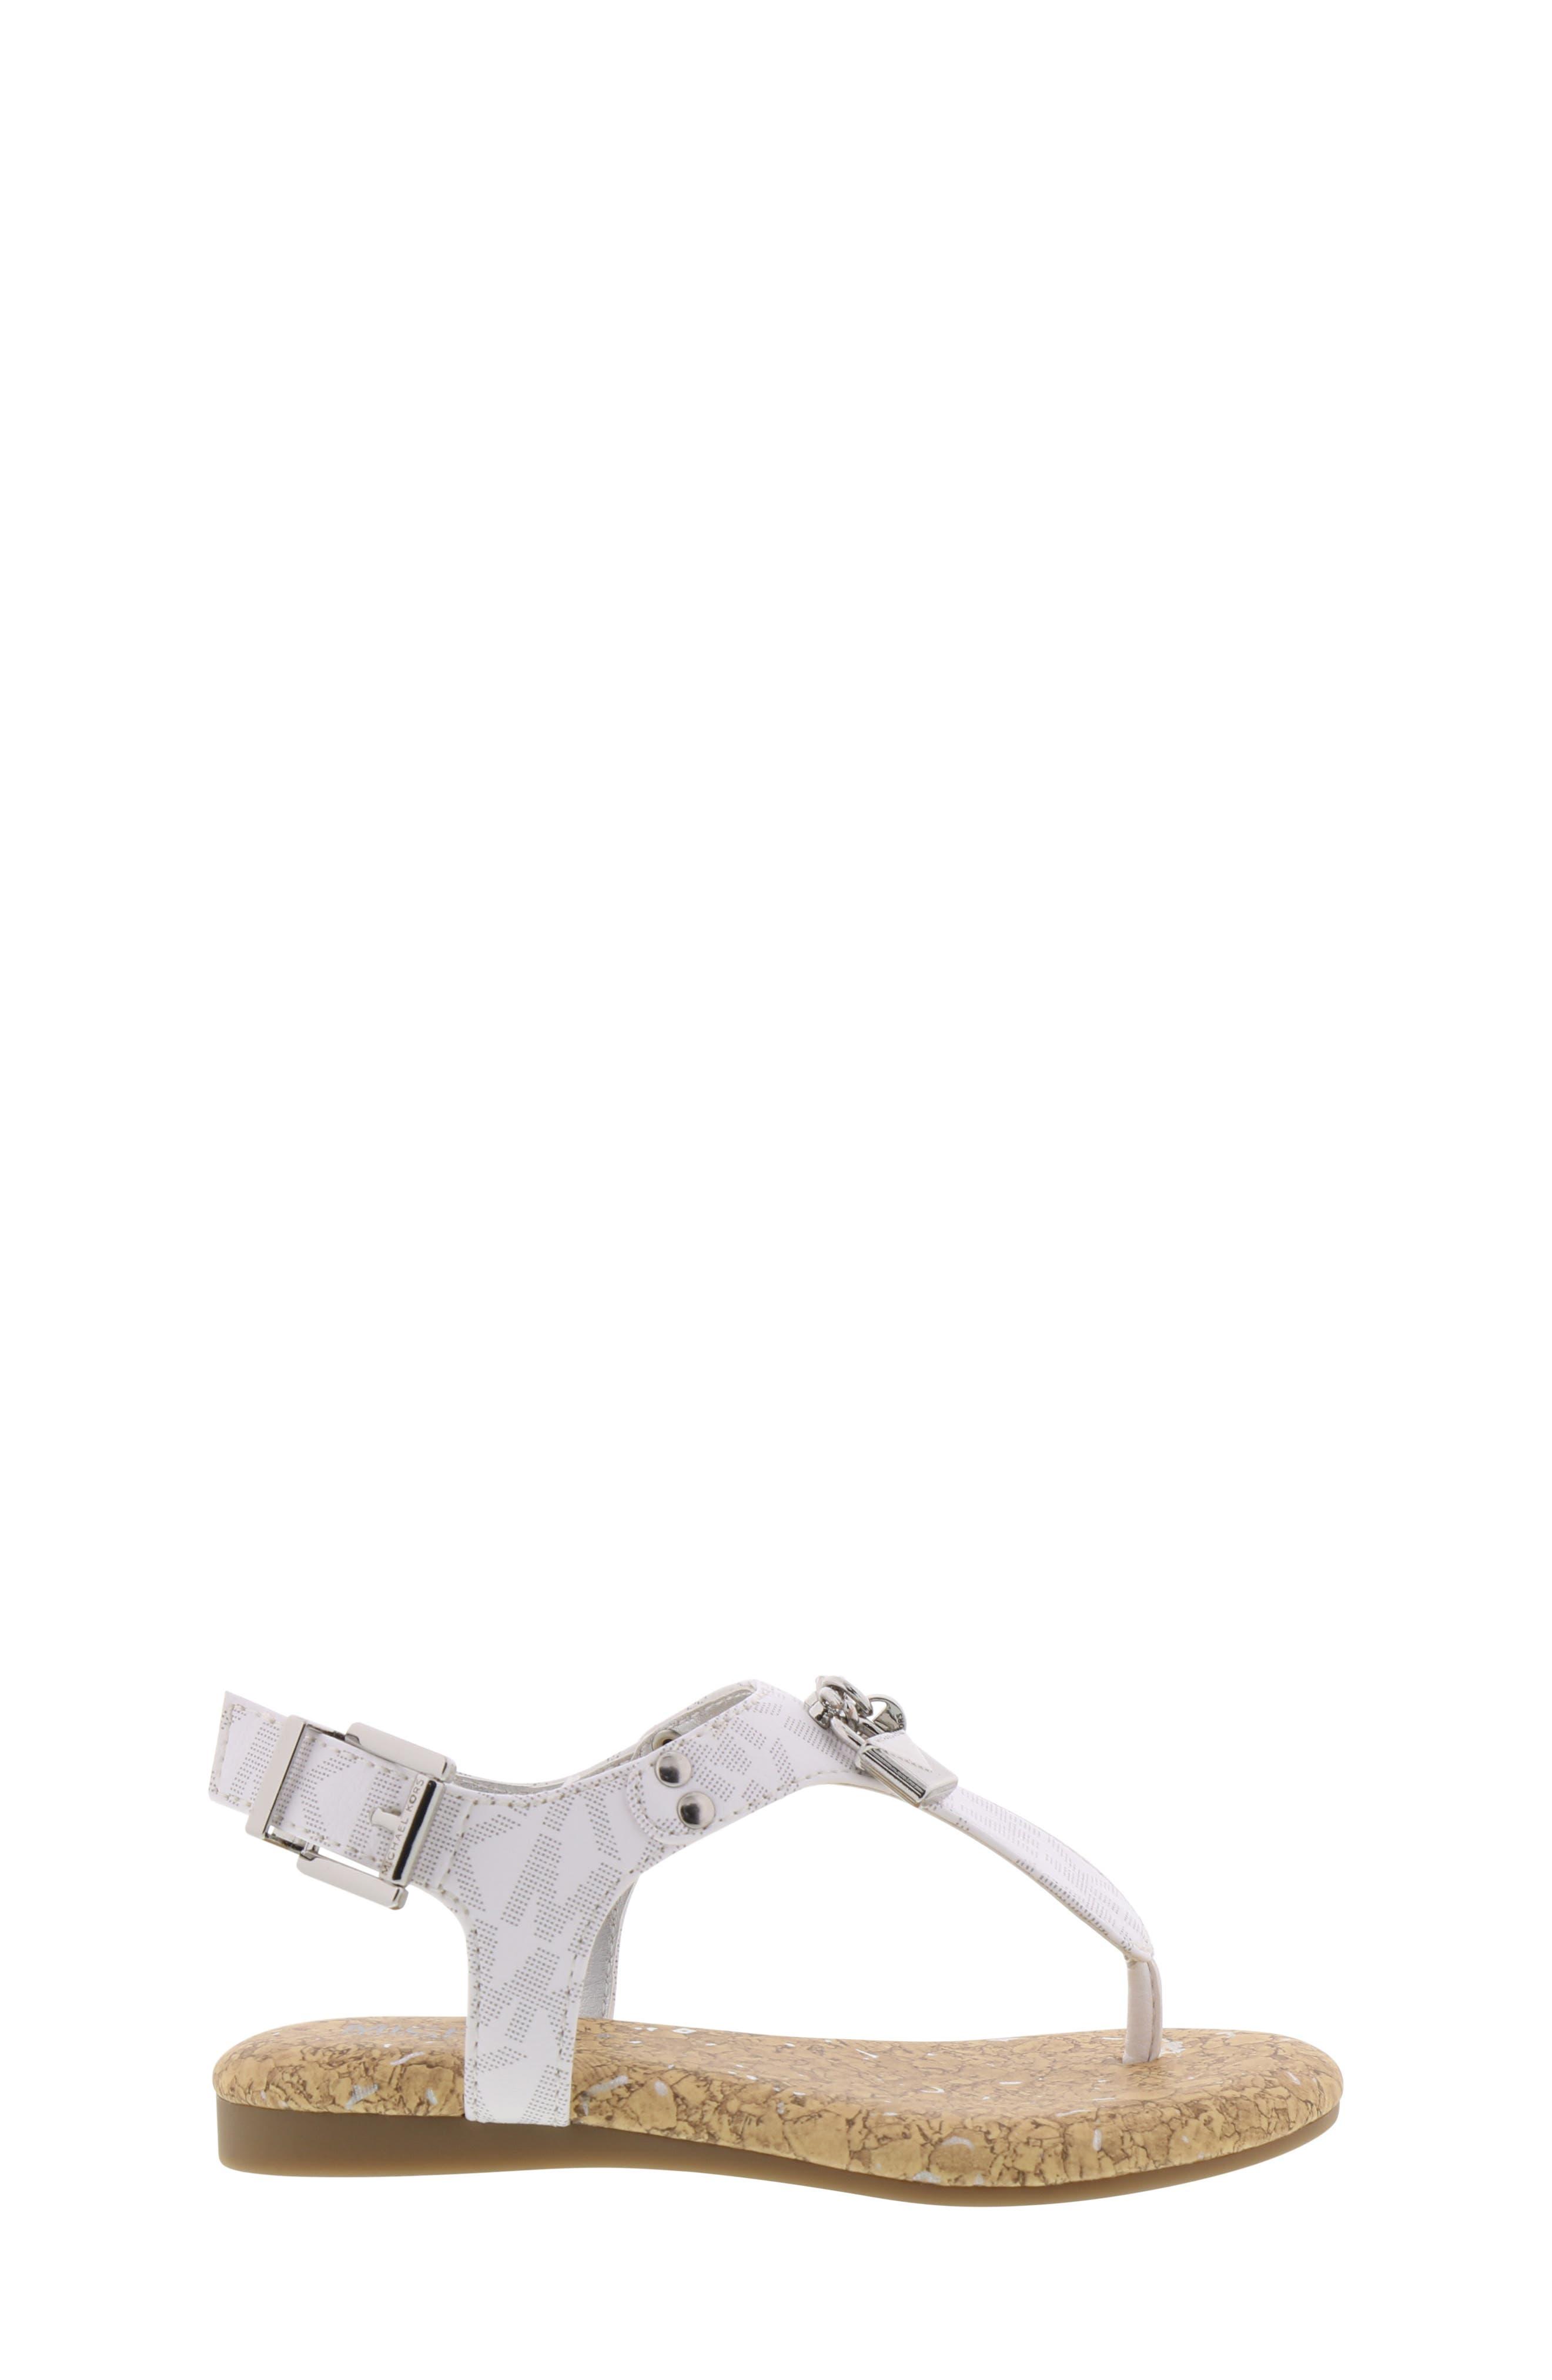 MICHAEL MICHAEL KORS, Tilly Cora Charm T-Strap Sandal, Alternate thumbnail 3, color, WHITE LOGO